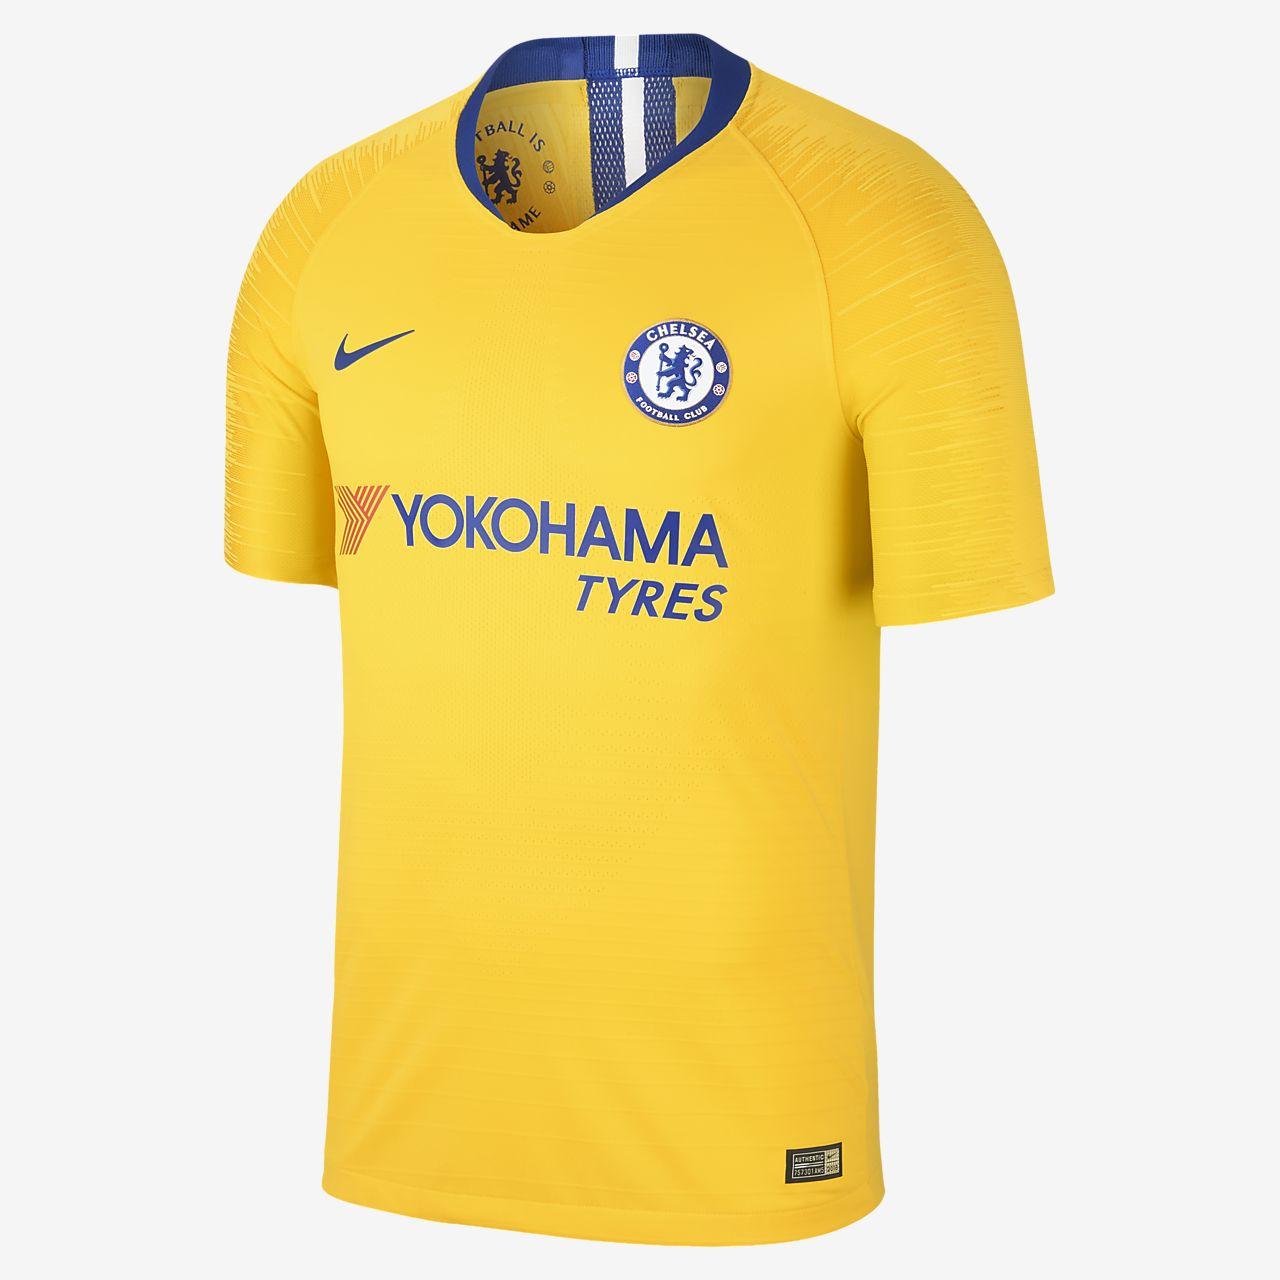 7d36f3fa1 2018 19 Chelsea FC Vapor Match Away Men s Soccer Jersey. Nike.com